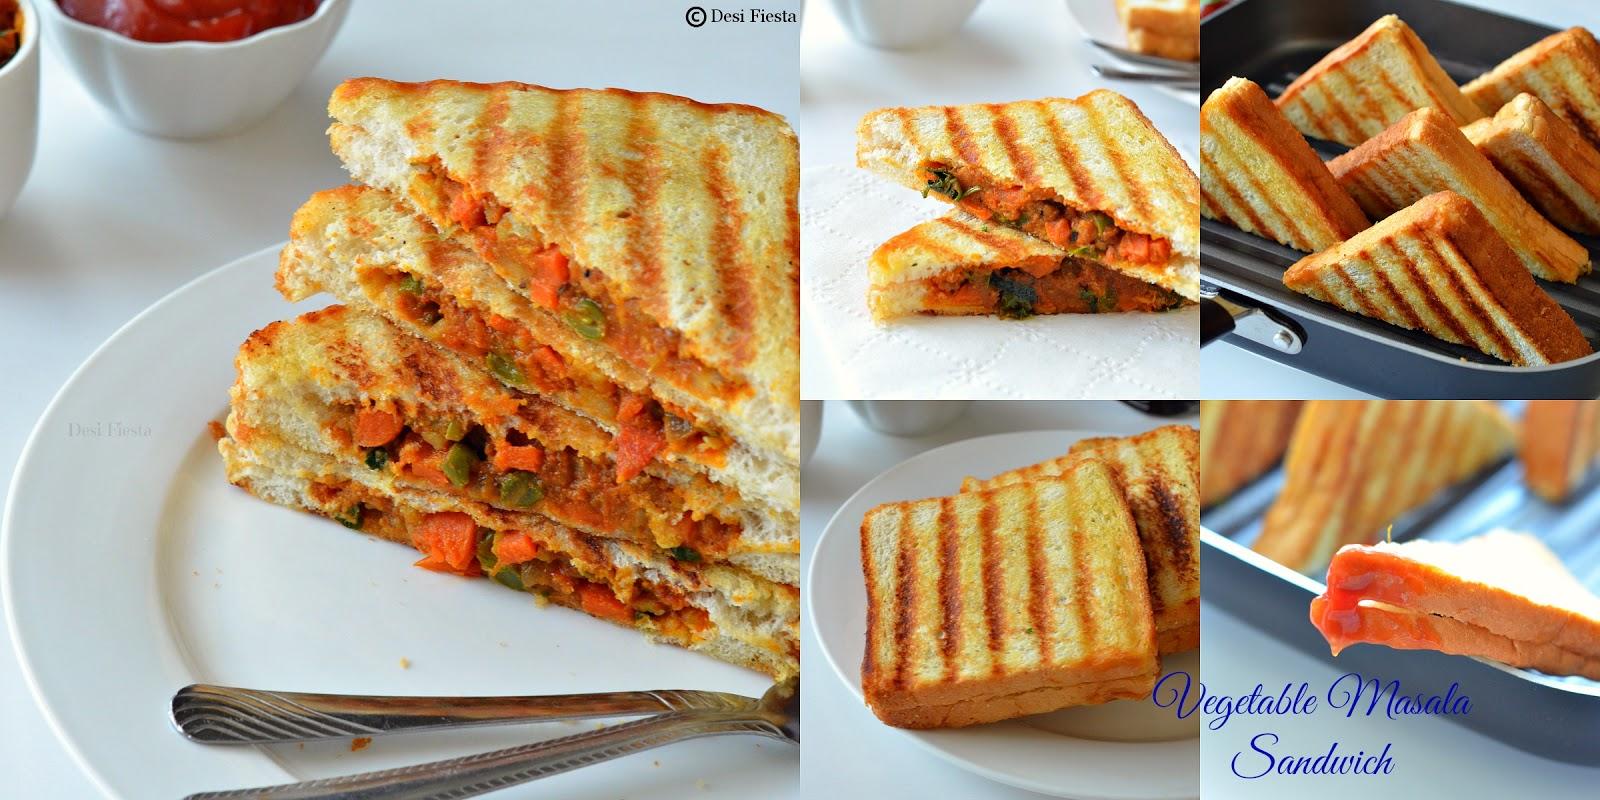 Masala filled sandwich